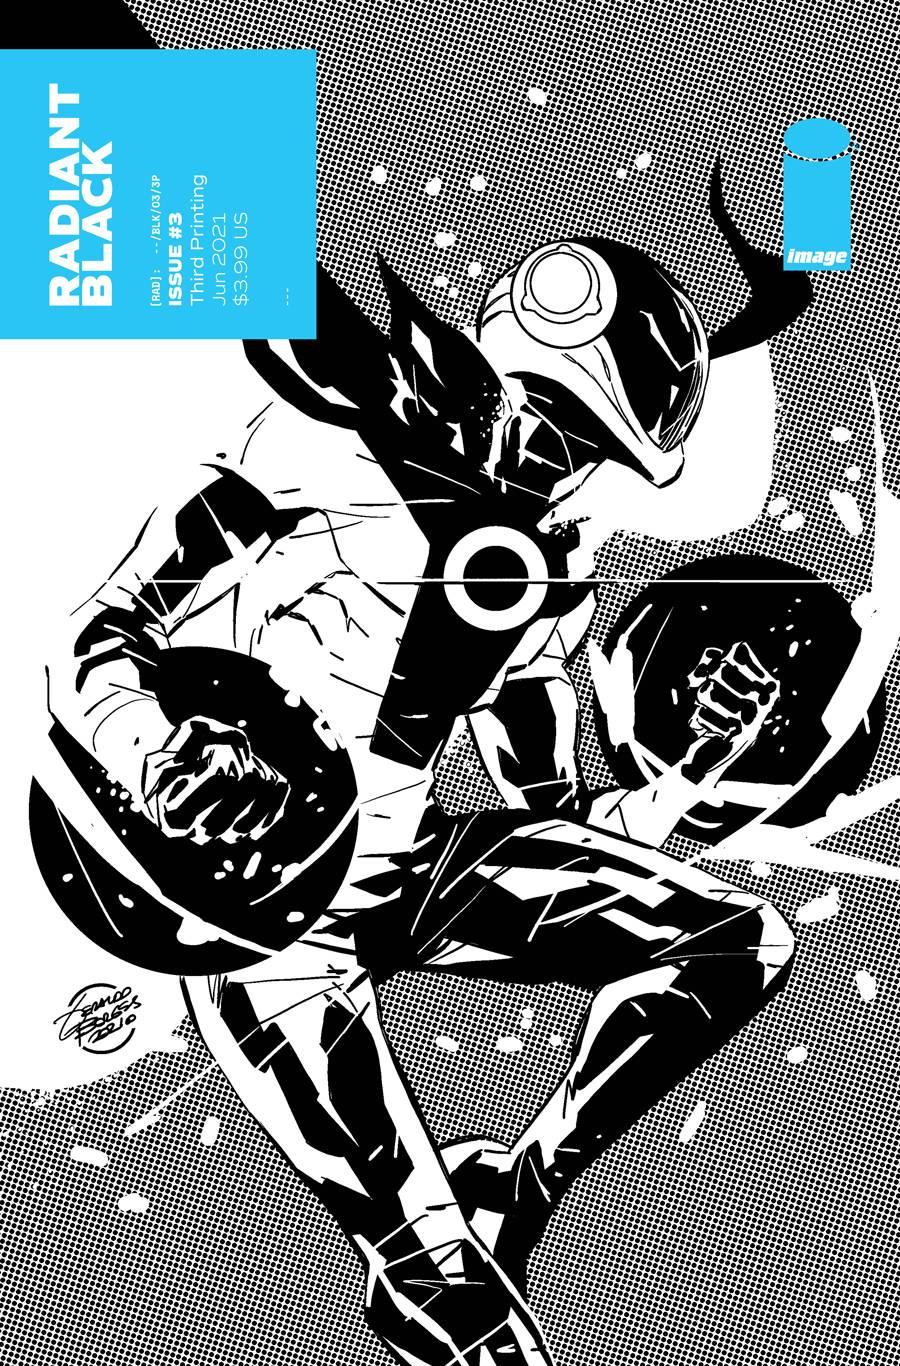 STL198307 ComicList: Image Comics New Releases for 06/23/2021